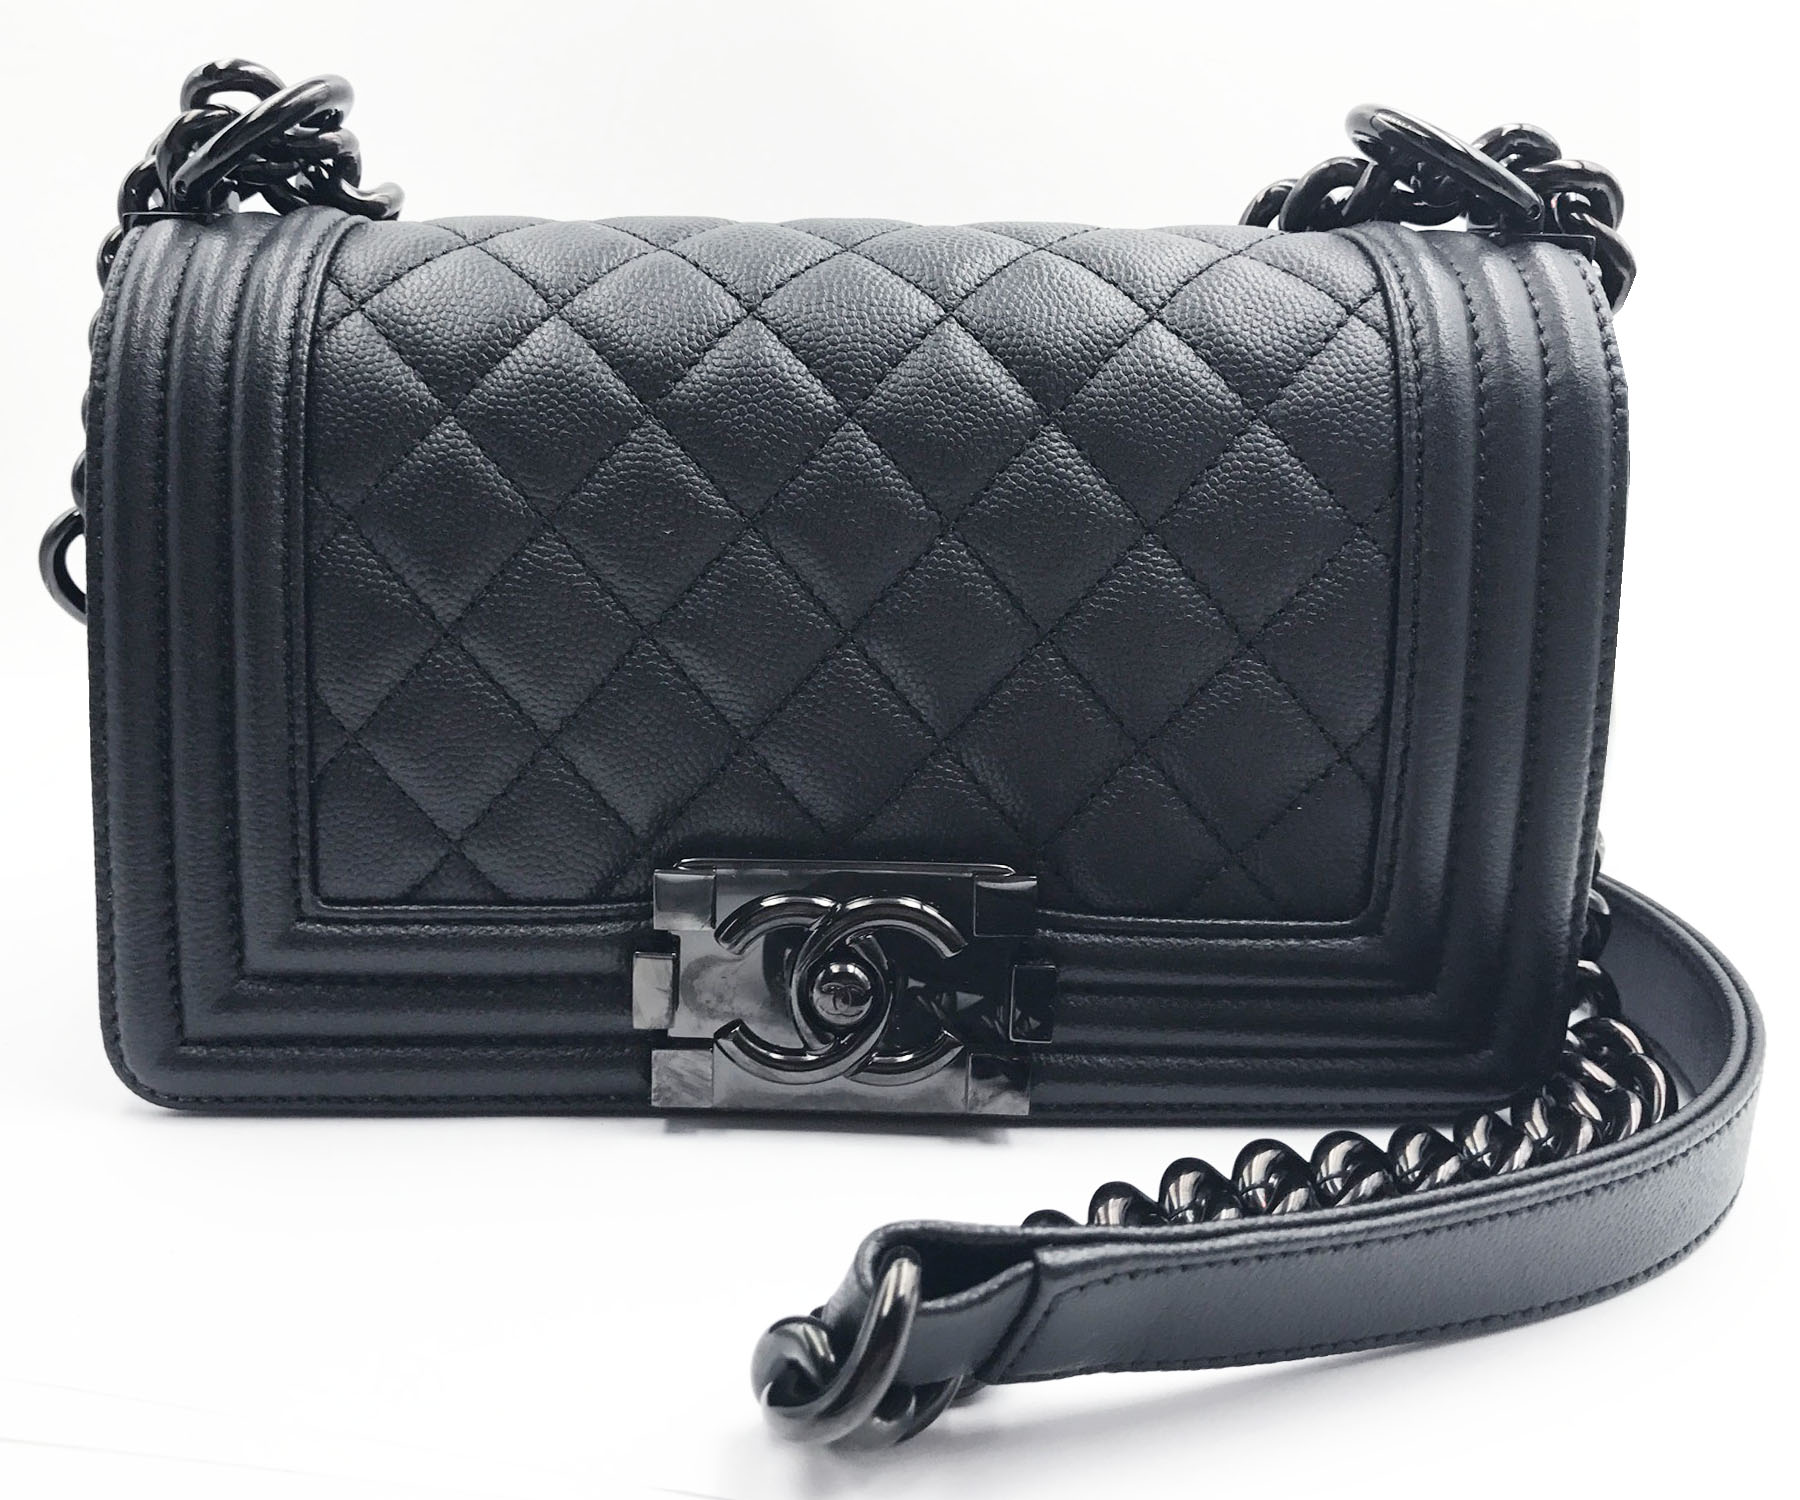 a33d7037bed Chanel Brand New 17 So Black Caviar Small Le Boy Crossbody